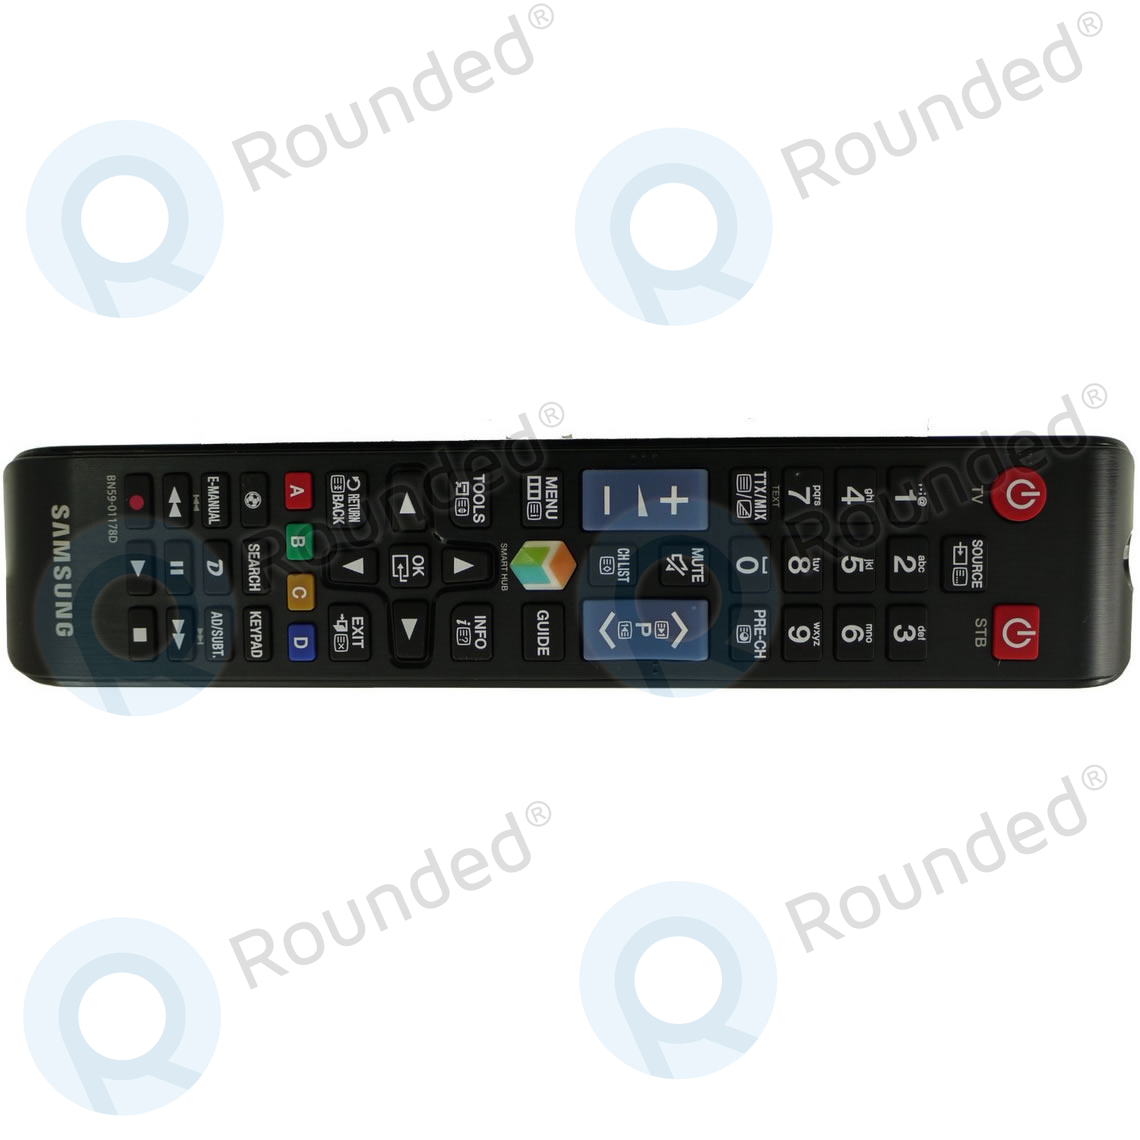 Samsung  Remote control TM1250A (BN59-01178D) BN59-01178D image-1